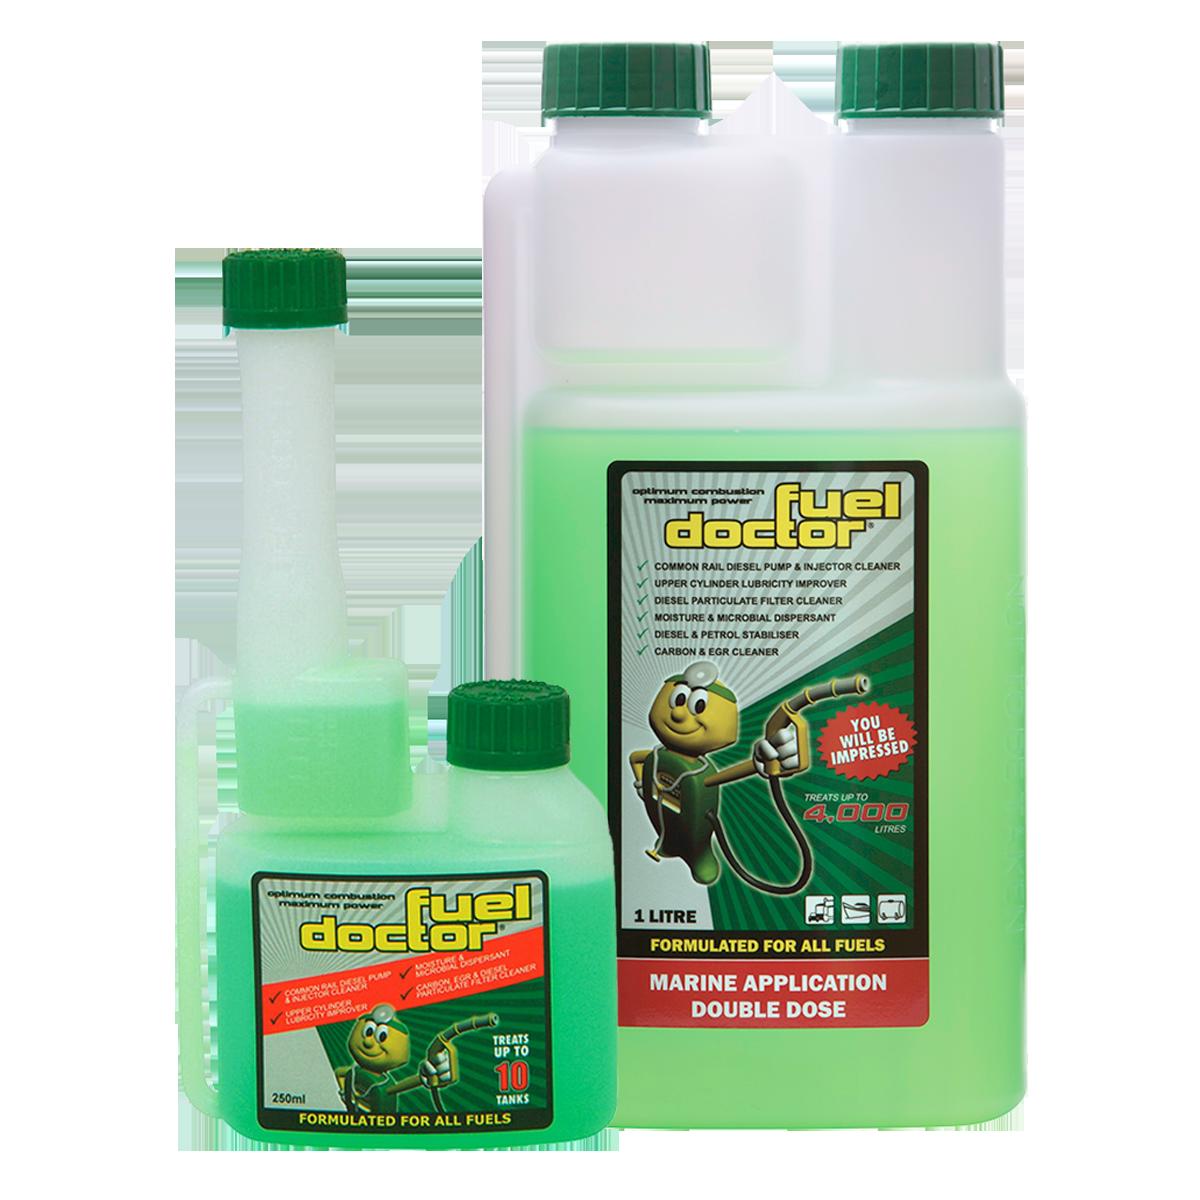 Fuel Doctor Fuel Conditioner 250ml+1L Bottles